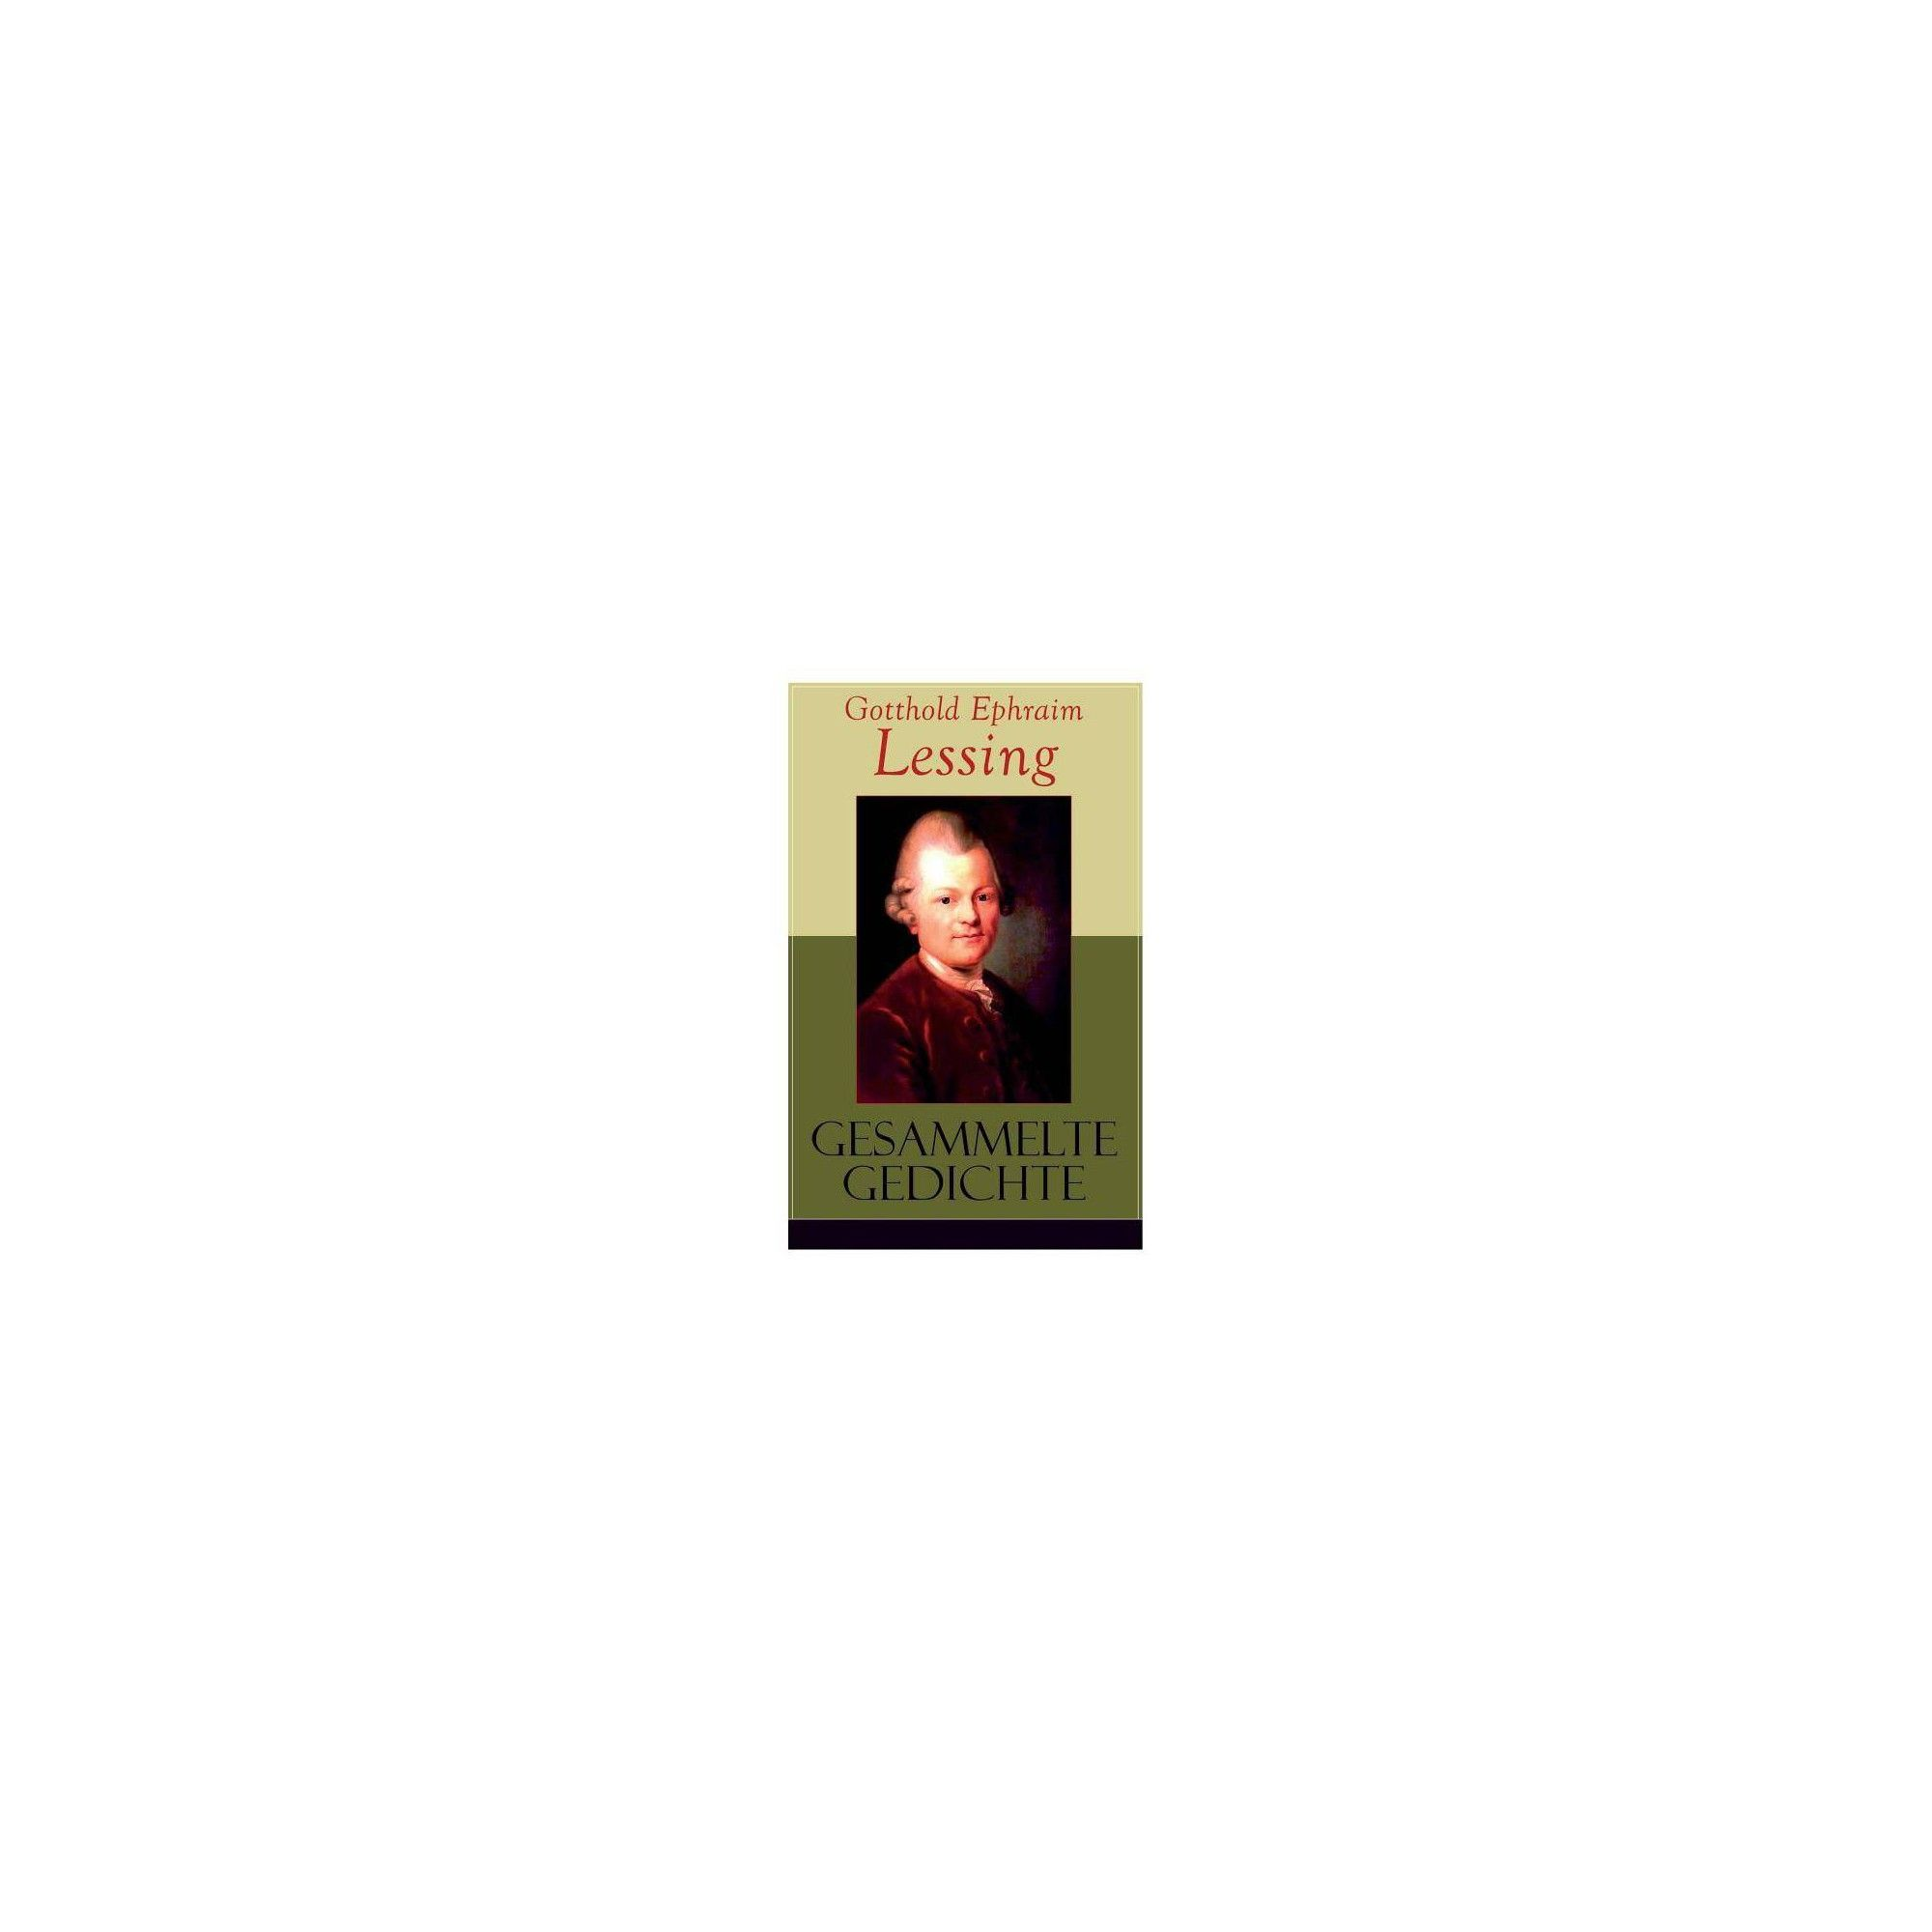 Gesammelte Gedichte By Gotthold Ephraim Lessing Paperback